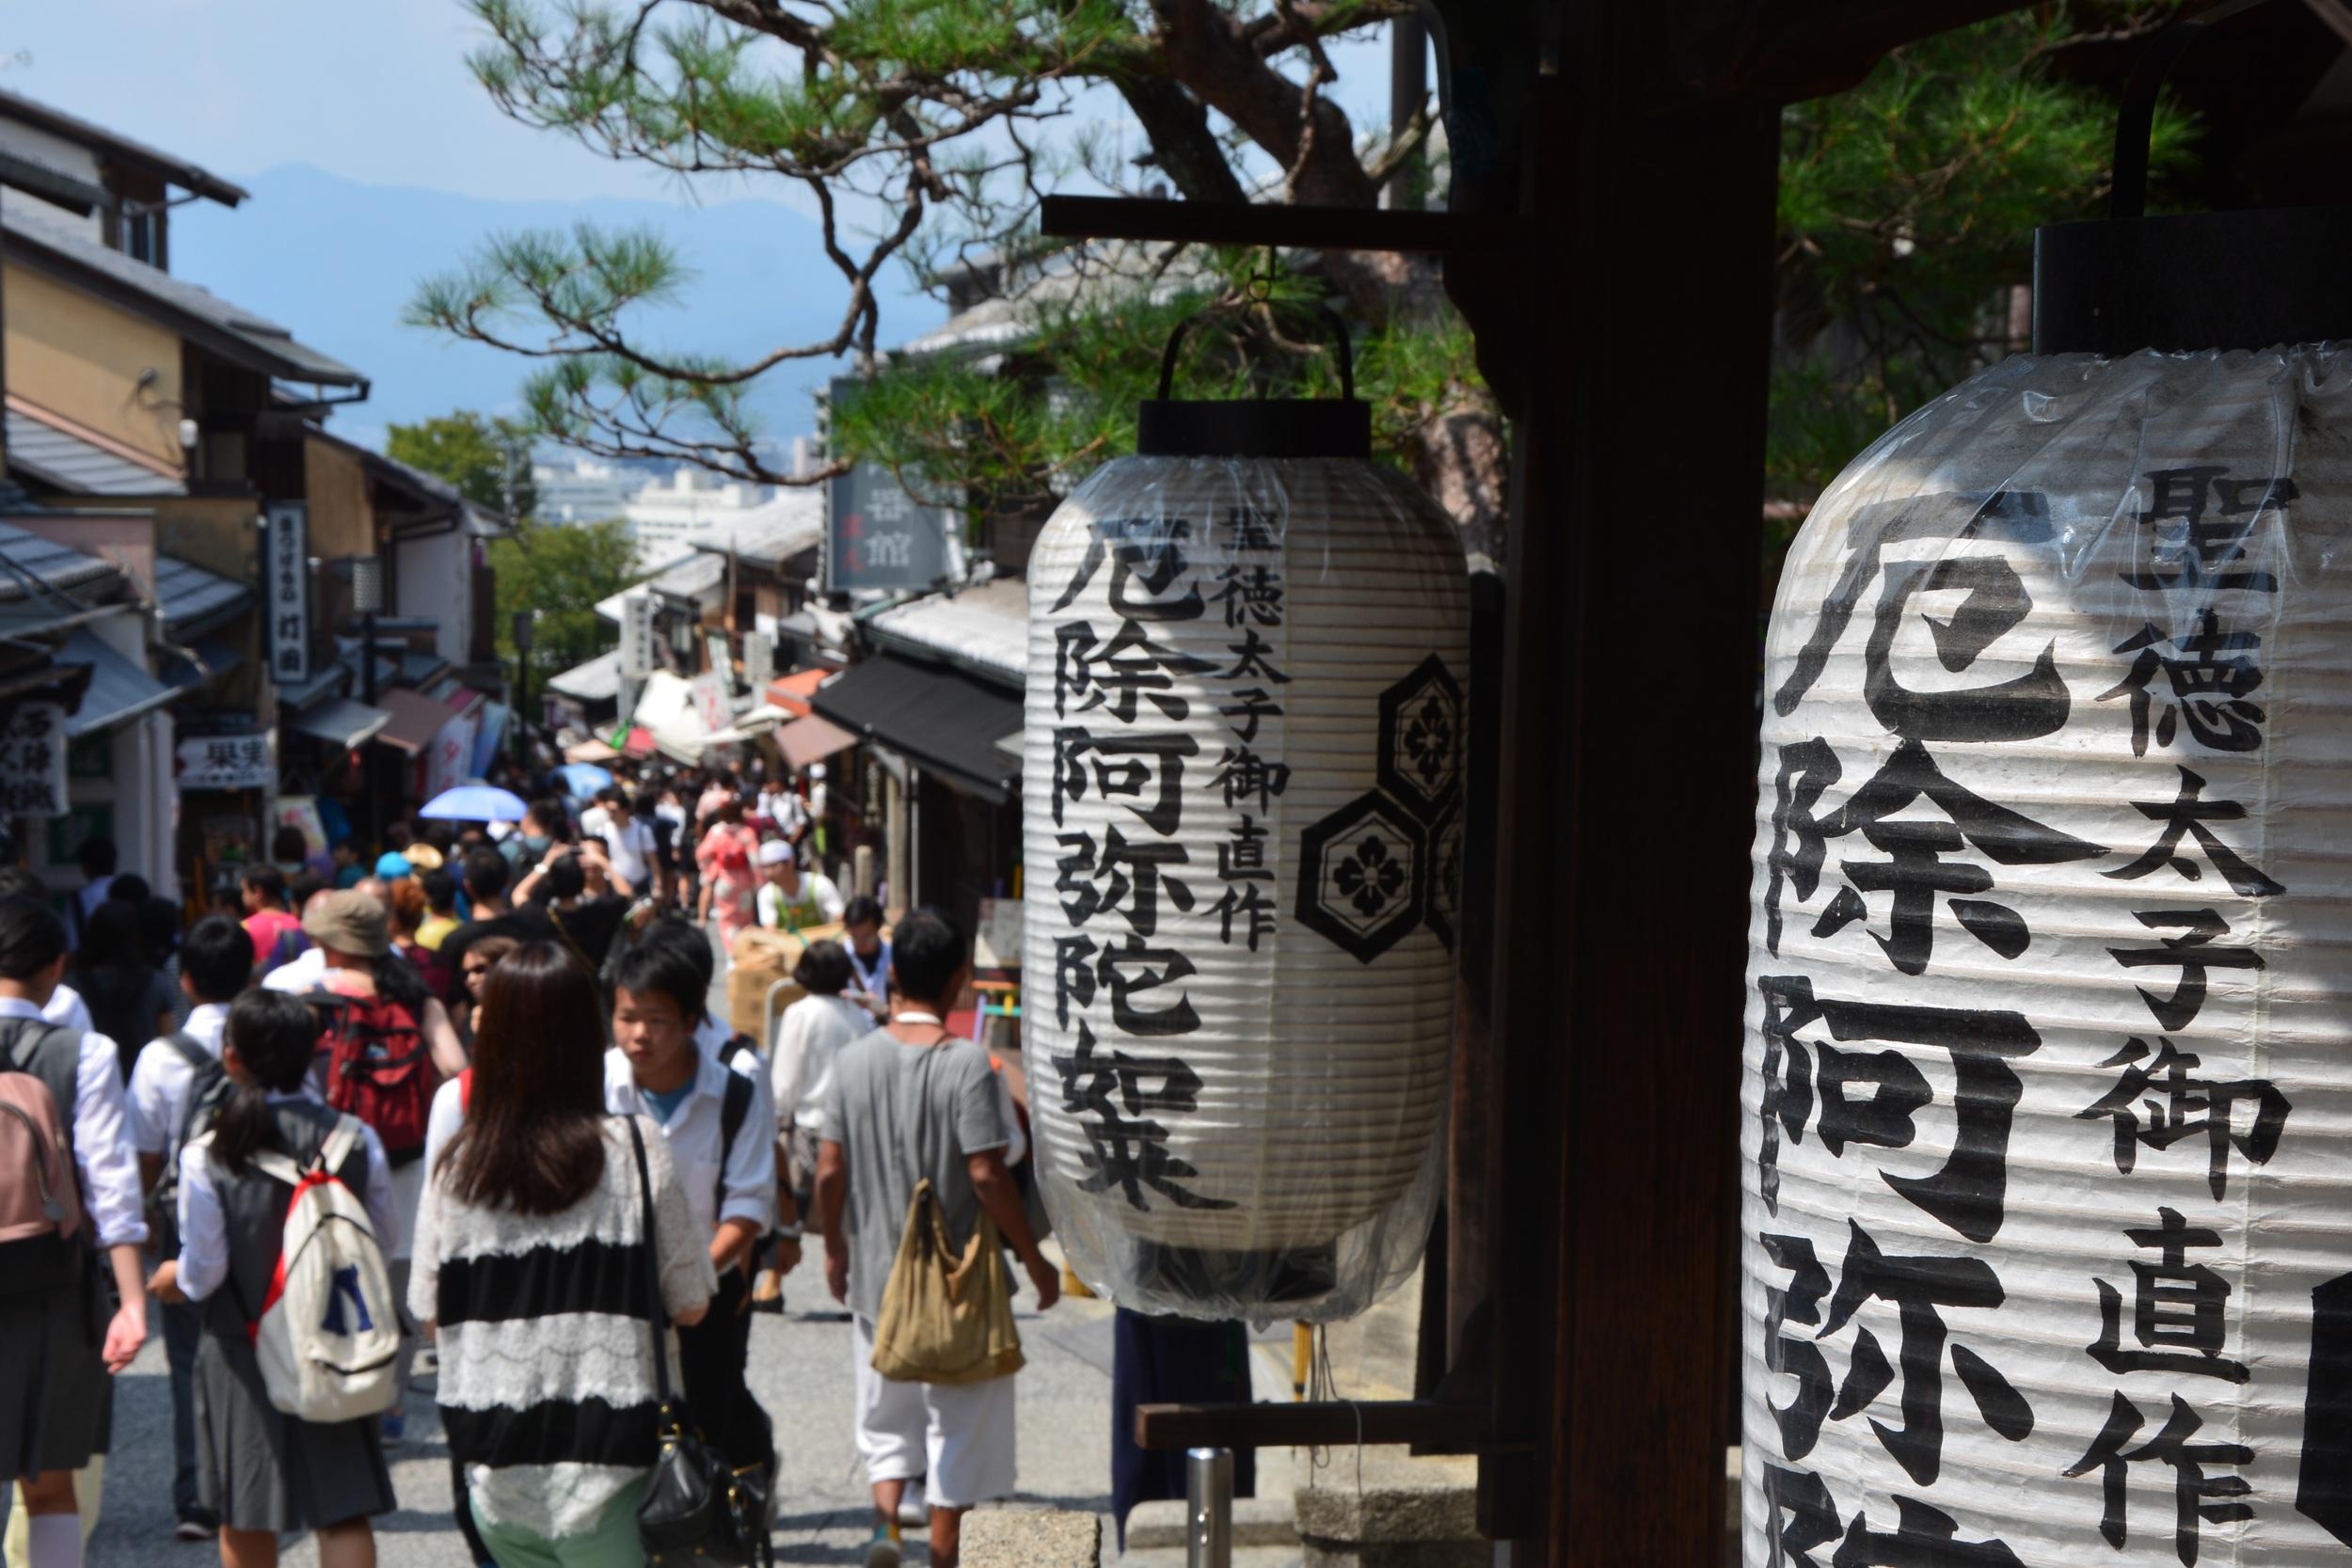 Crowded street scene - shops, food and tourists.